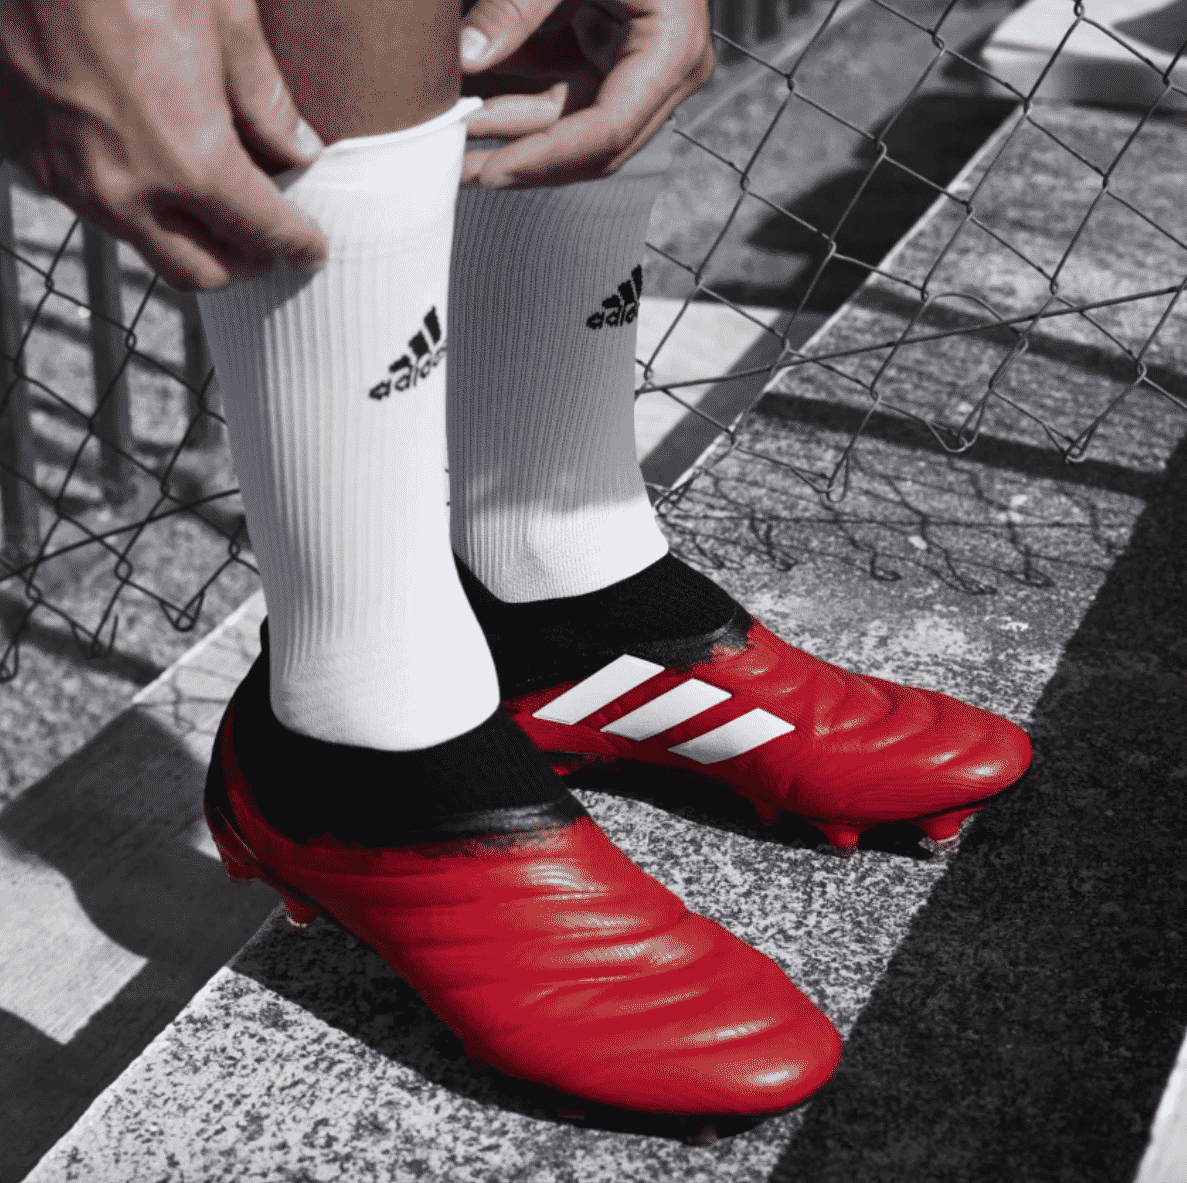 adidas-copa-pack-mutator-janvier-2020-1